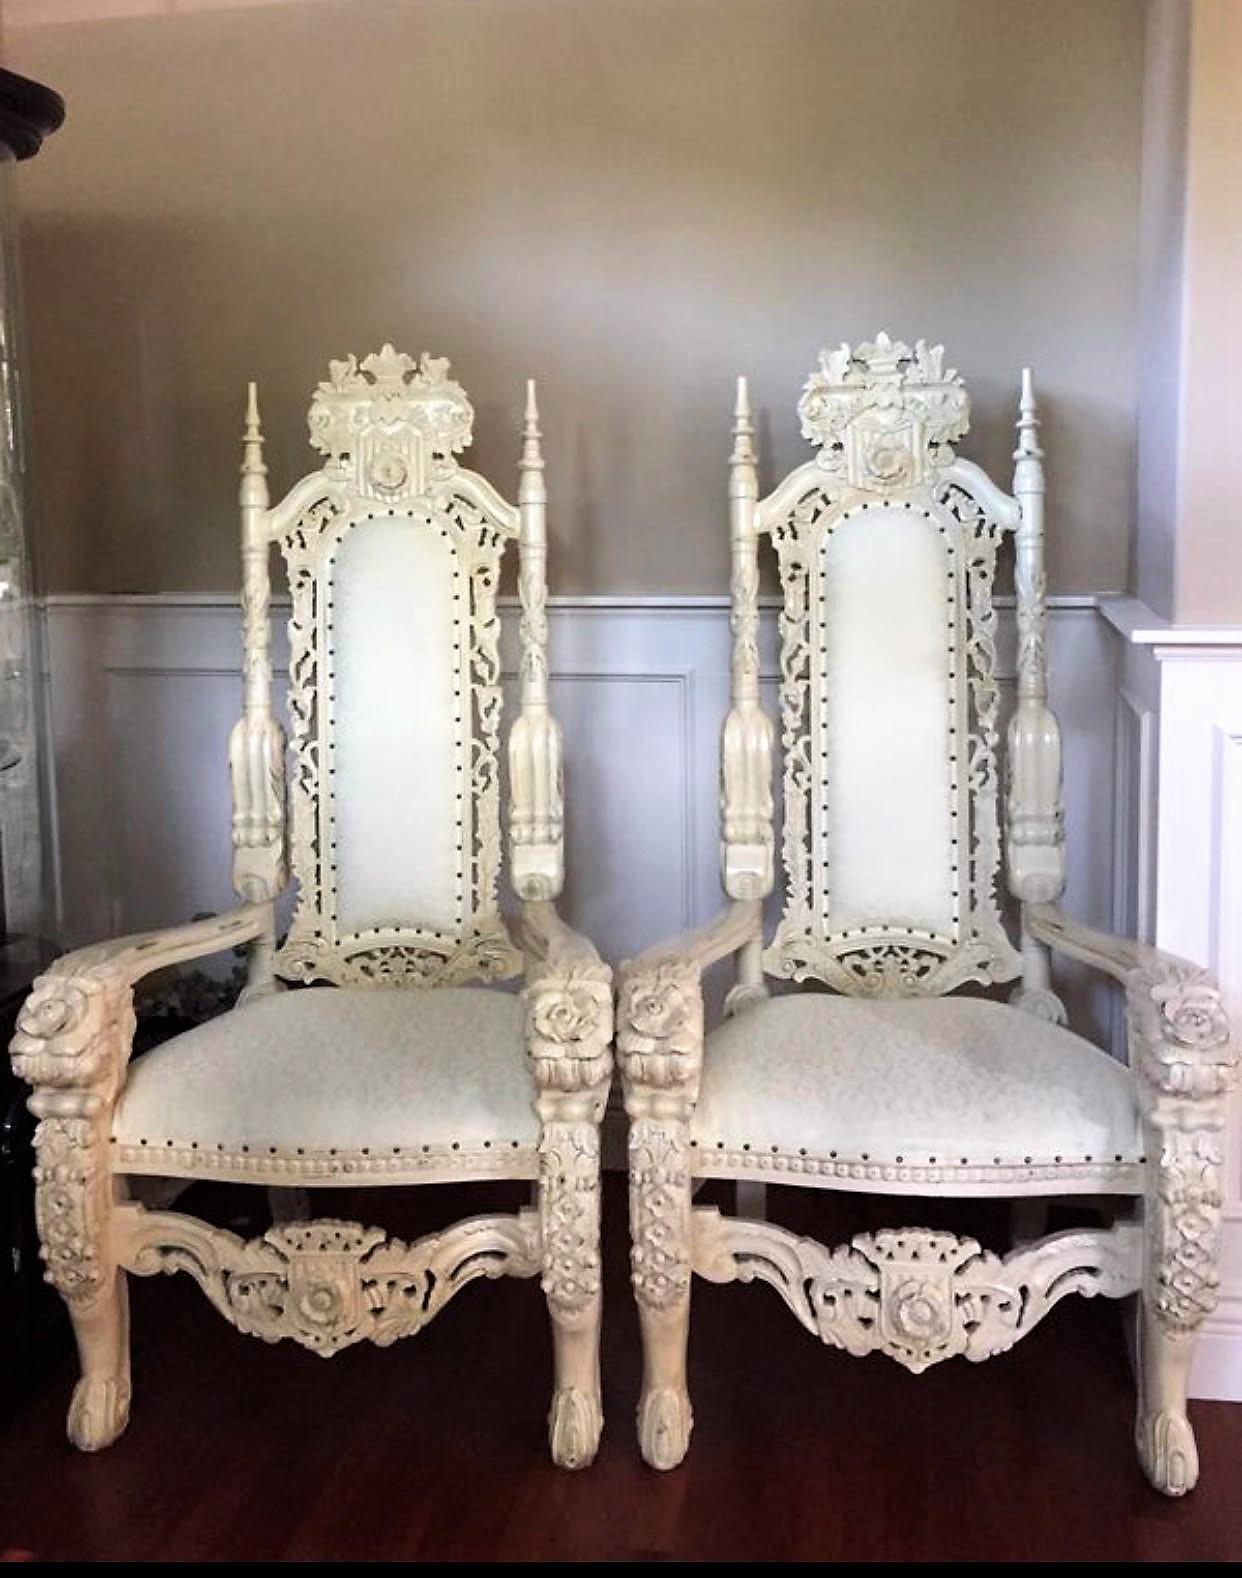 Grand Royal Chairs.jpg